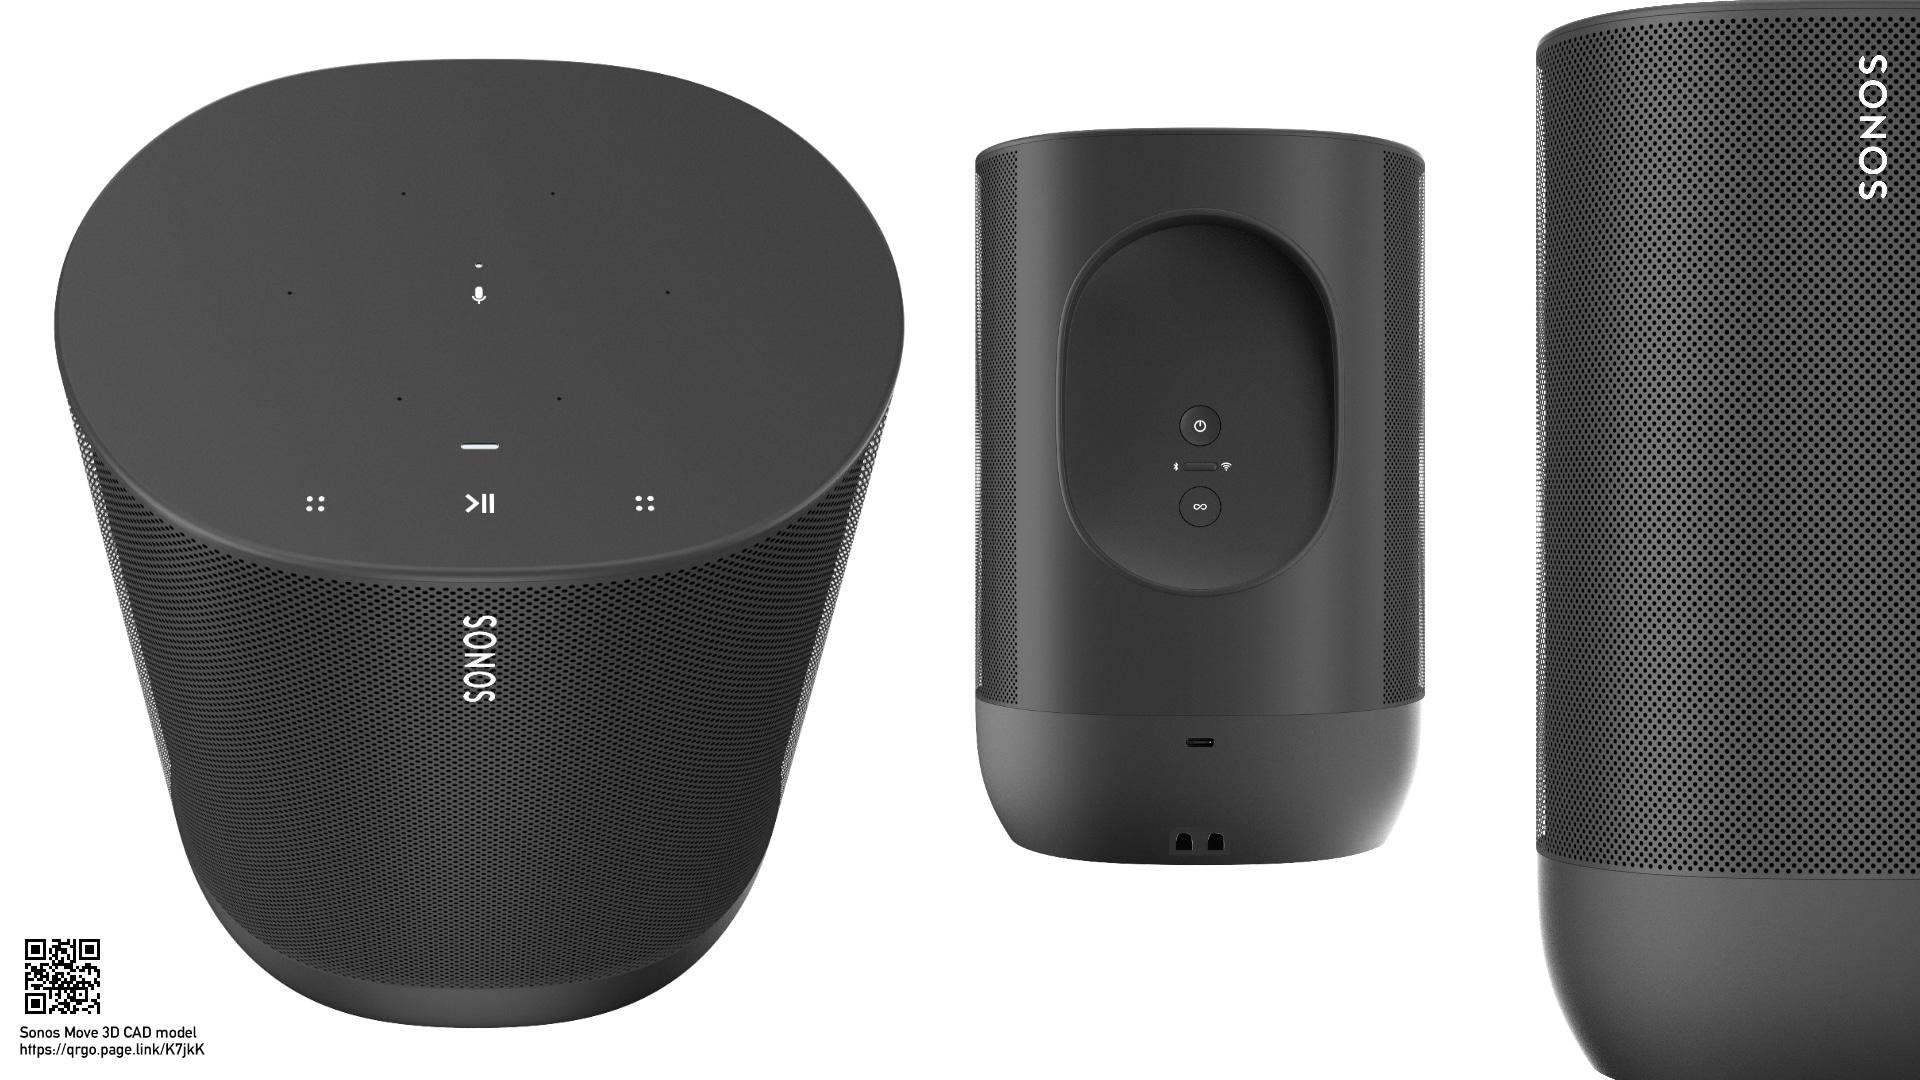 Sonos Move - 3D CAD speaker model